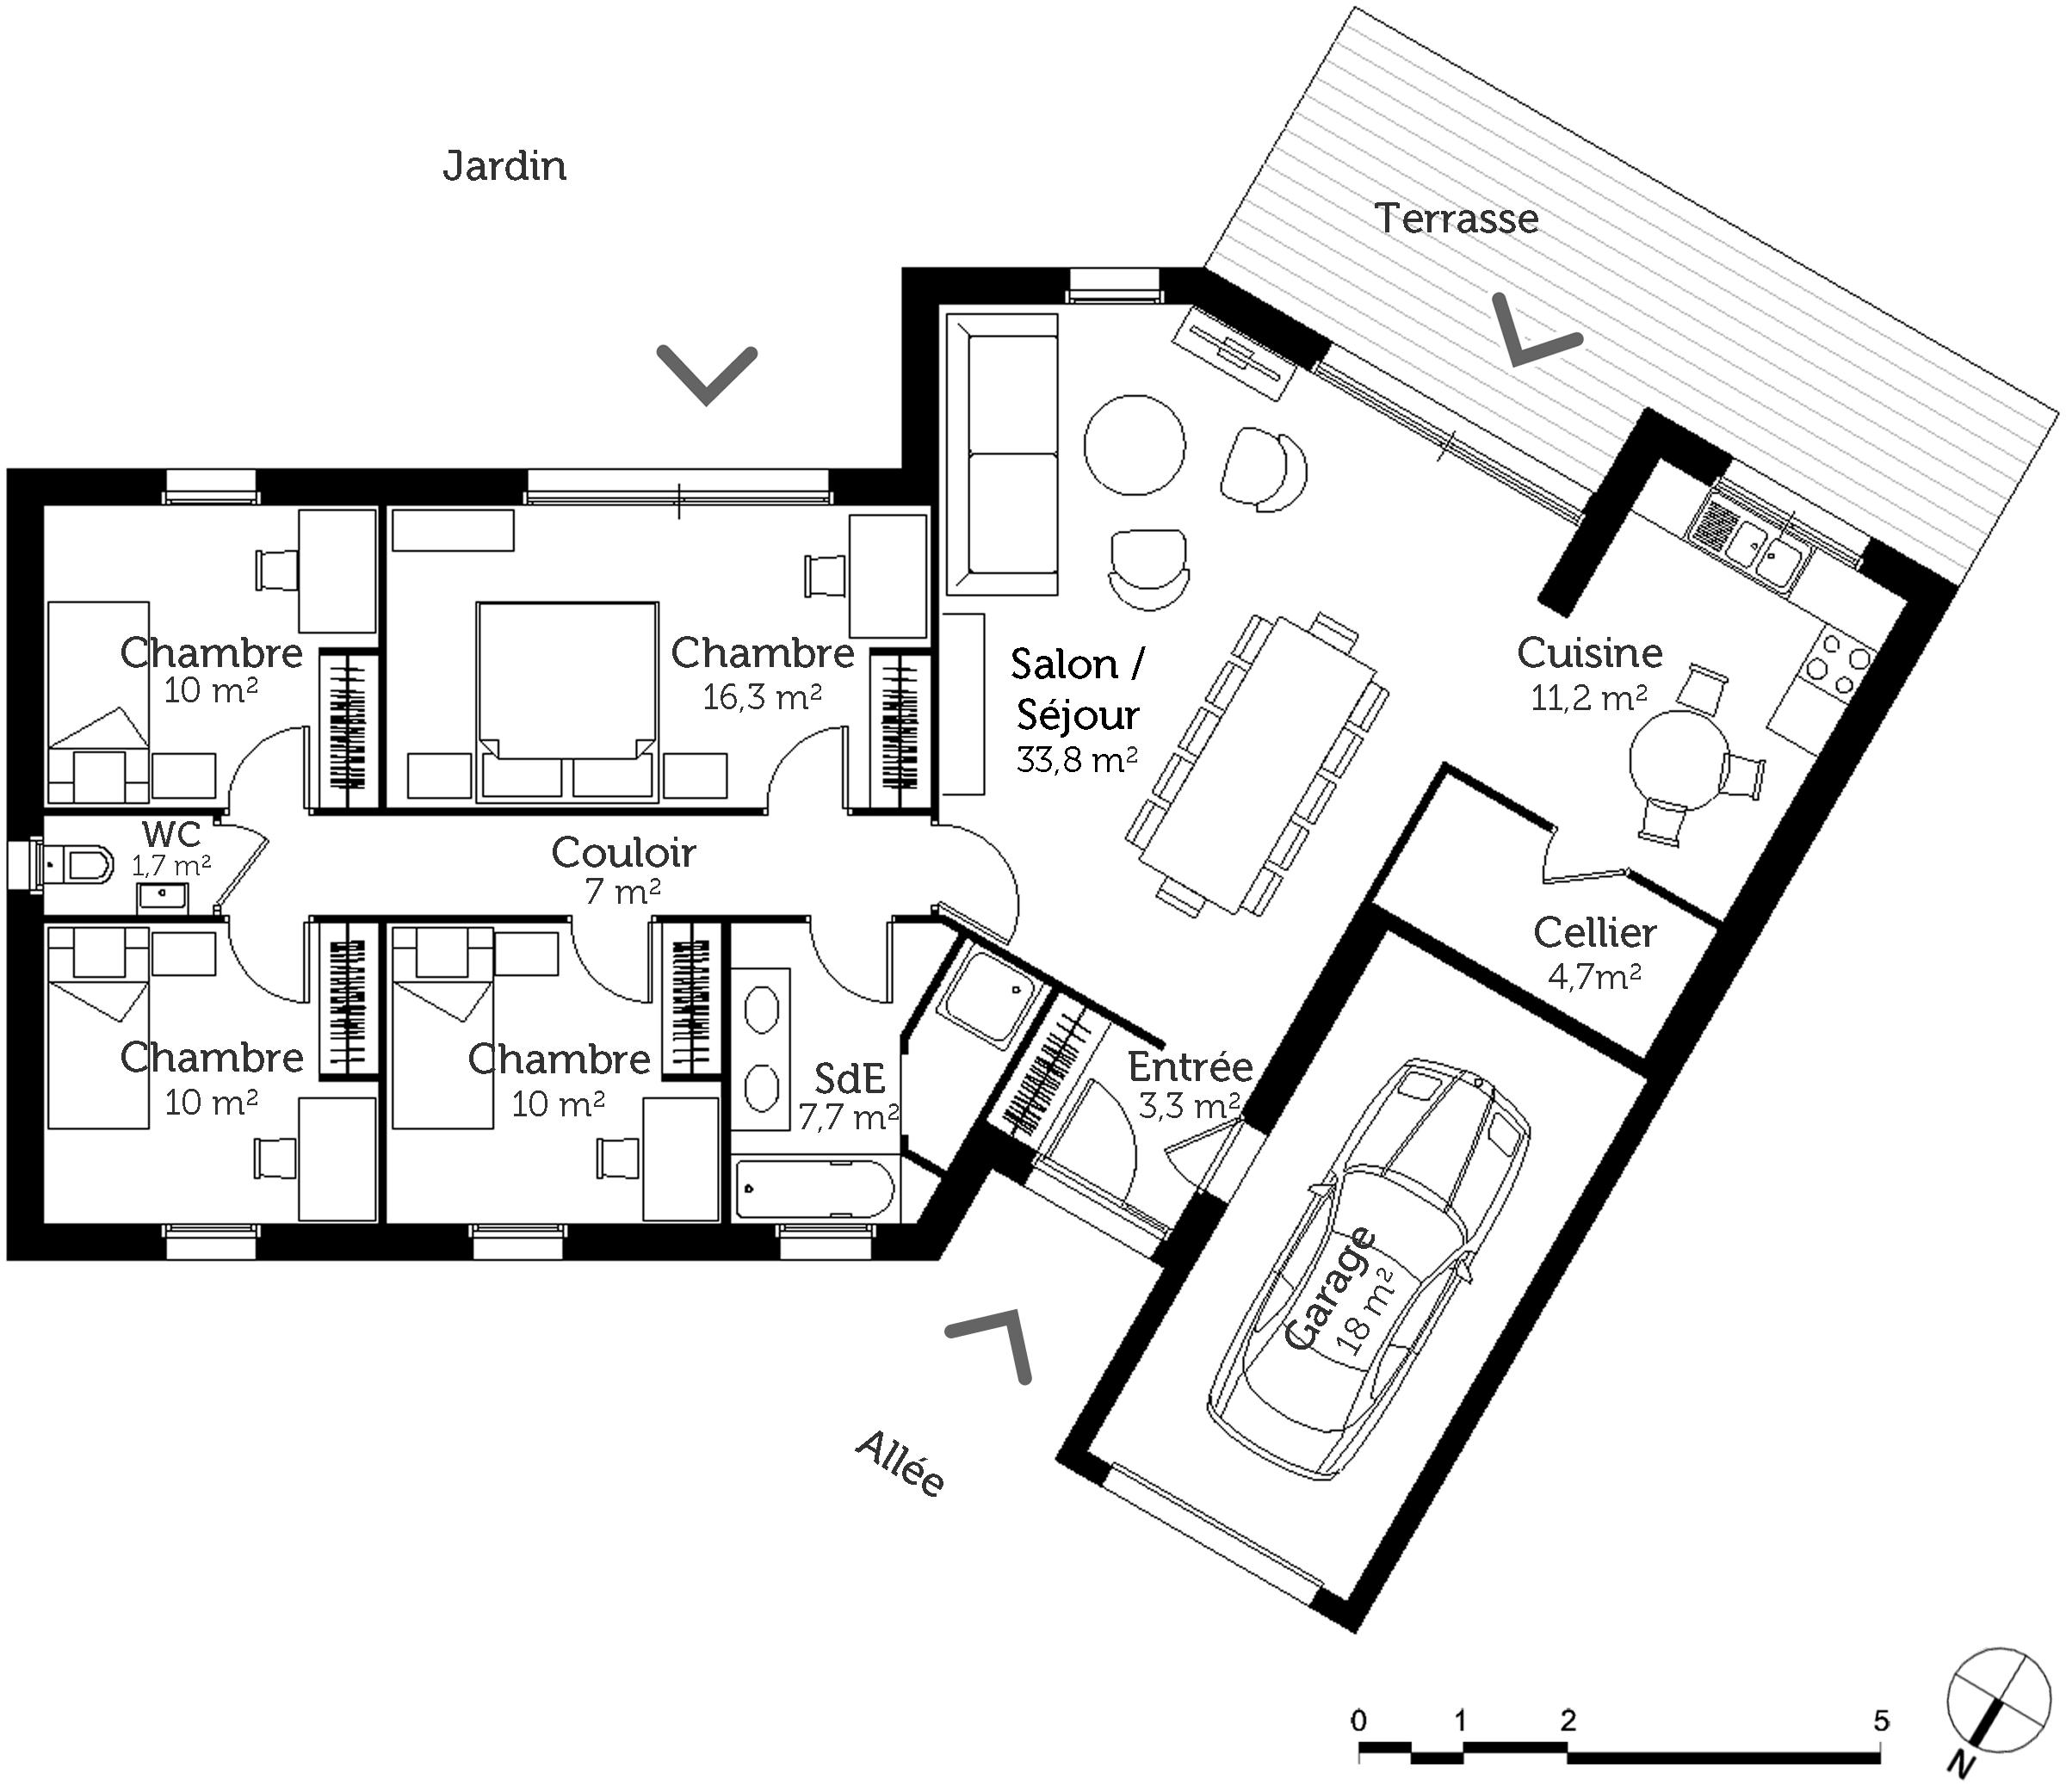 plan de maison 4 chambres pdf